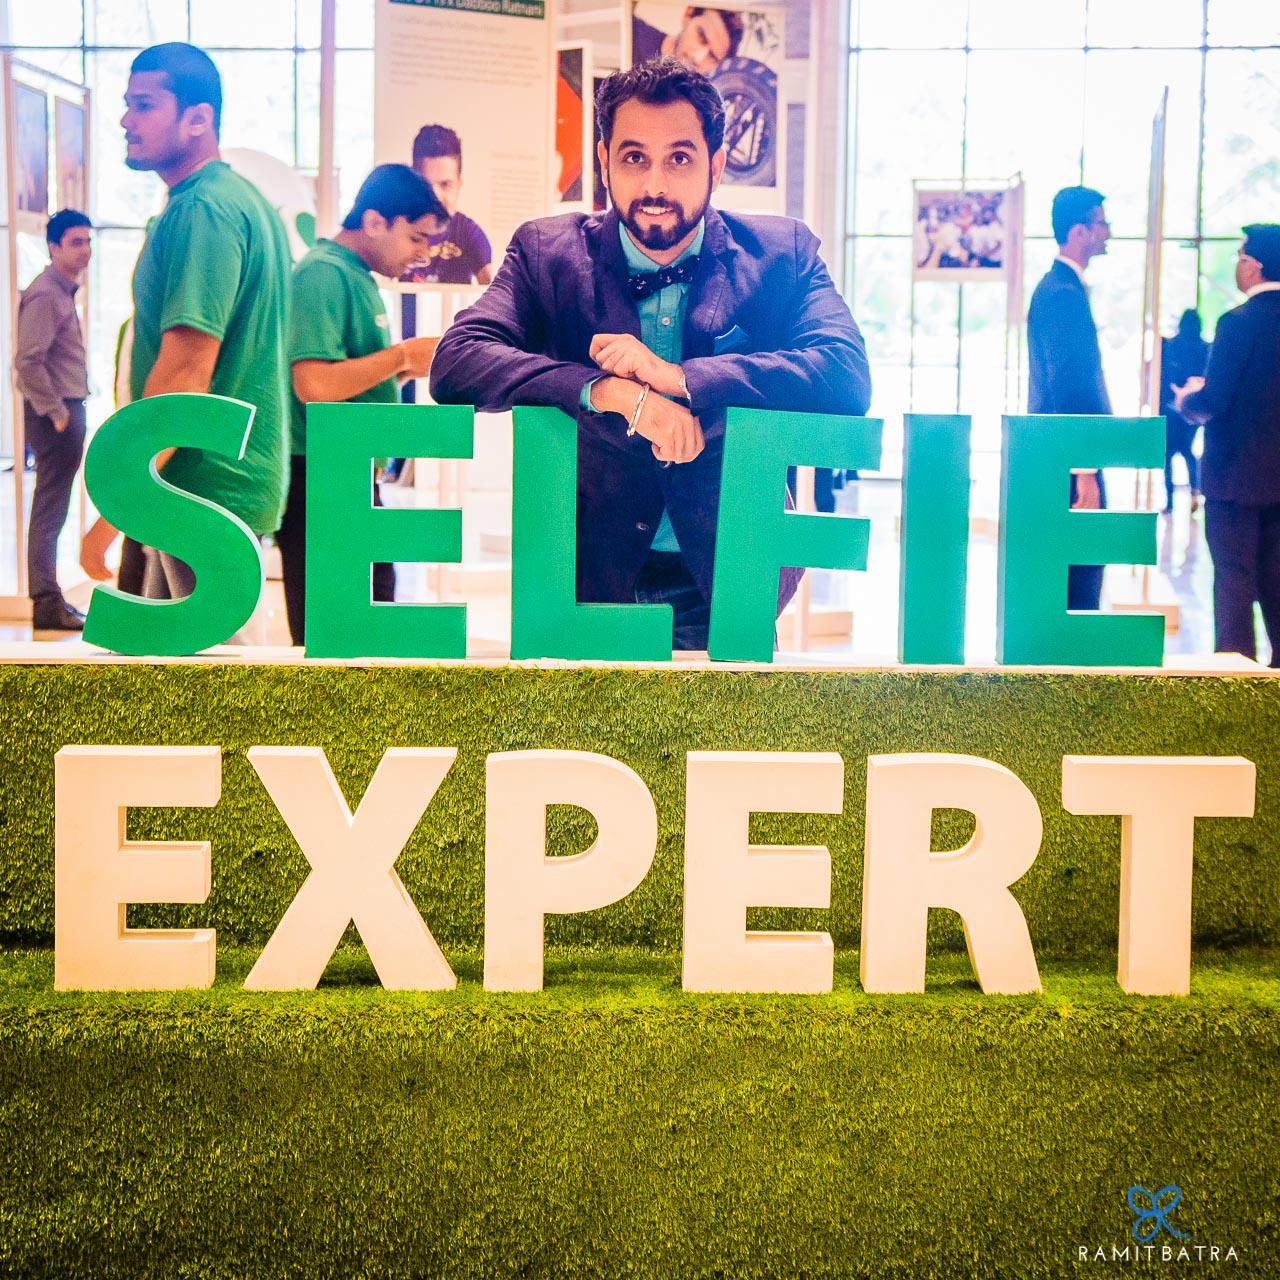 Oppo-F1s-SelfieExpert-RamitBatra-13